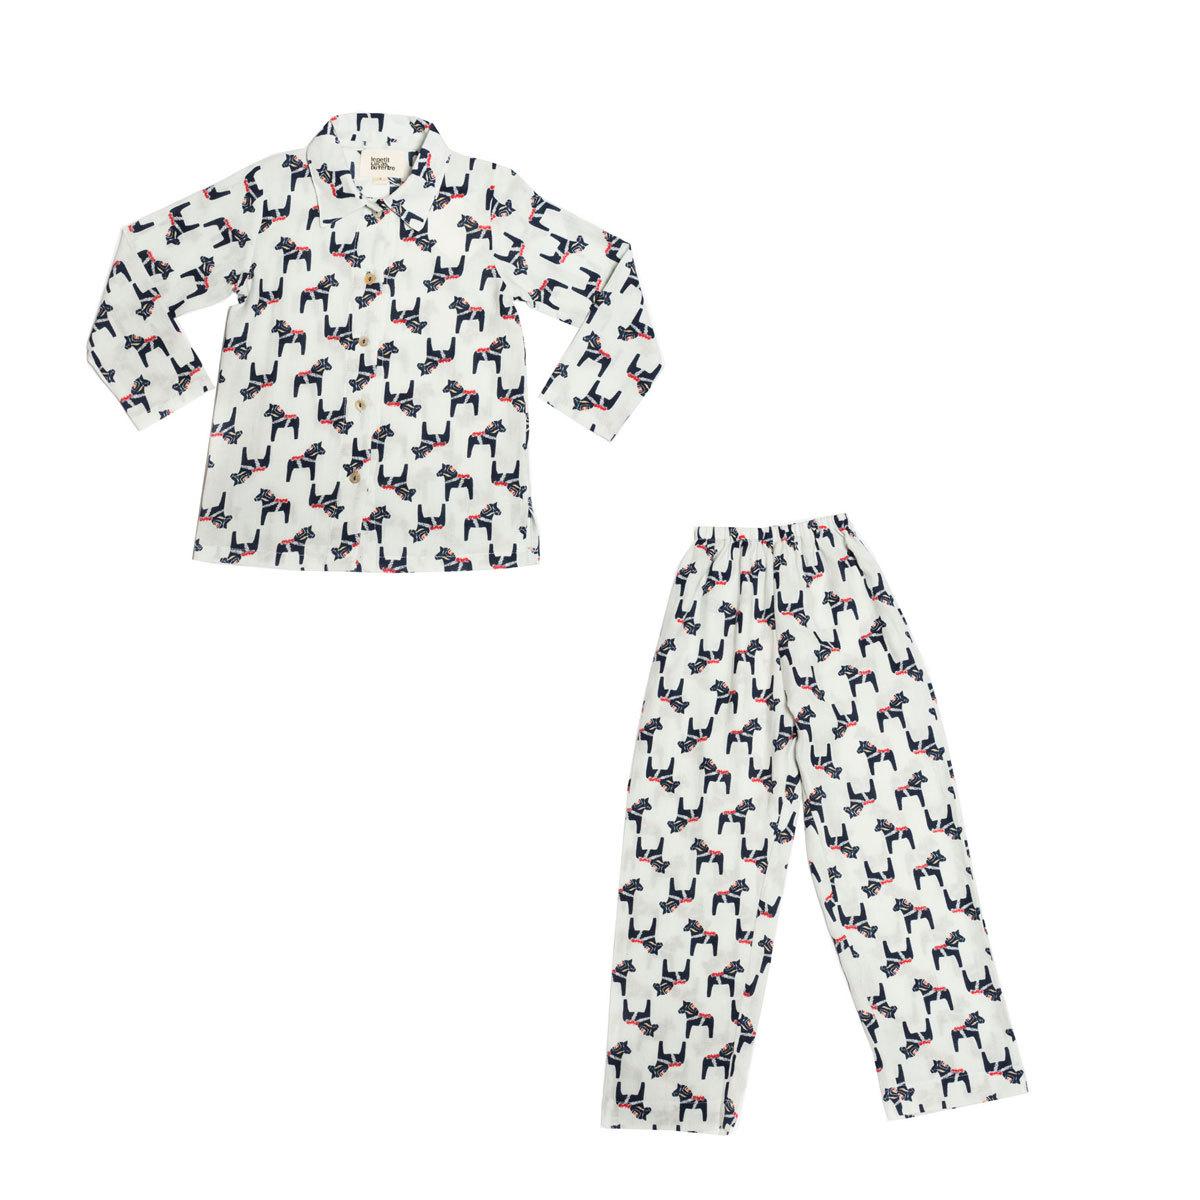 Body et Pyjama Pyjama 2 Pièces - Horse - 3 ans Pyjama 2 Pièces - Horse - 3 ans